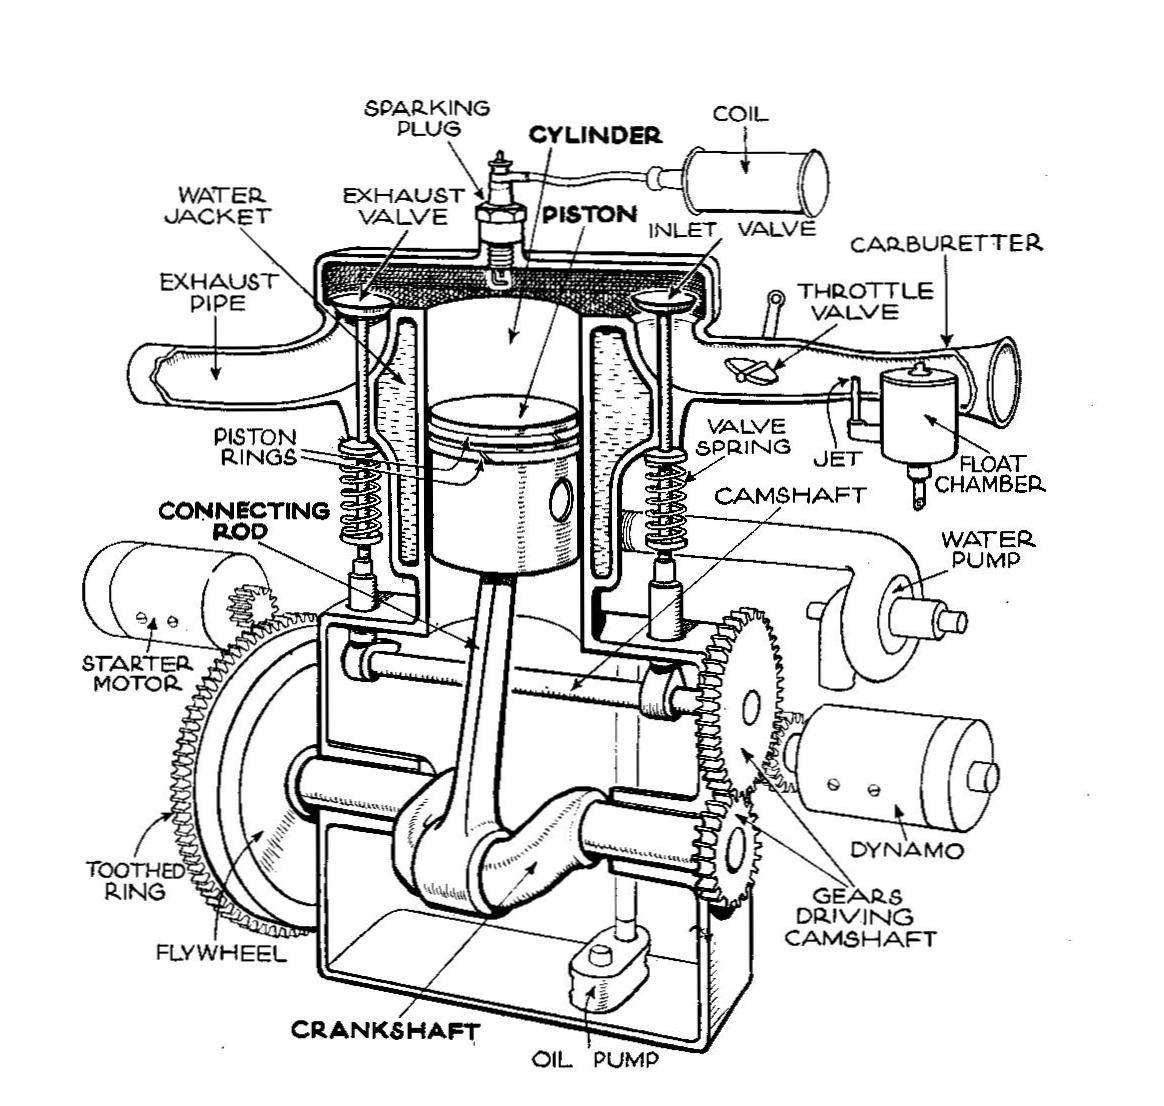 medium resolution of single cylinder t head engine autocar handbook 13th ed 1935 e36 m3 engine cylinder diagram engine cylinder diagram